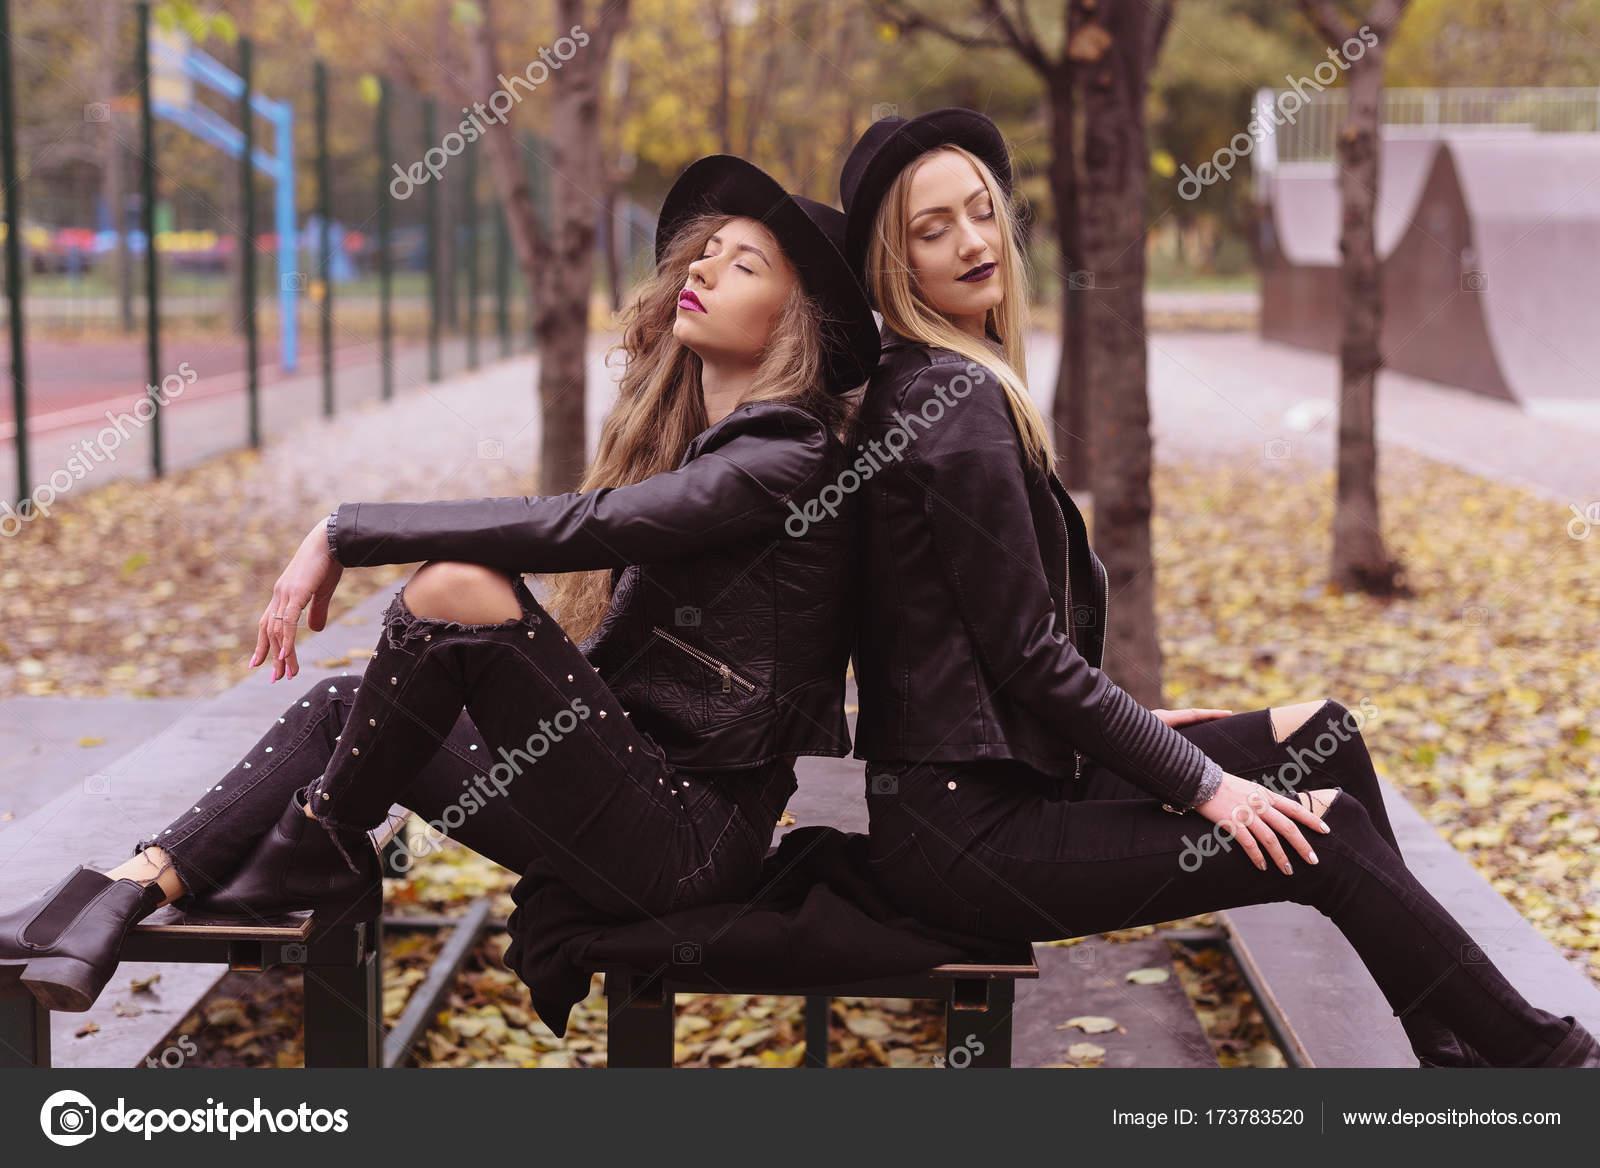 Street Fashion Concept Closeup Portrait Of A Two Pretty Girls